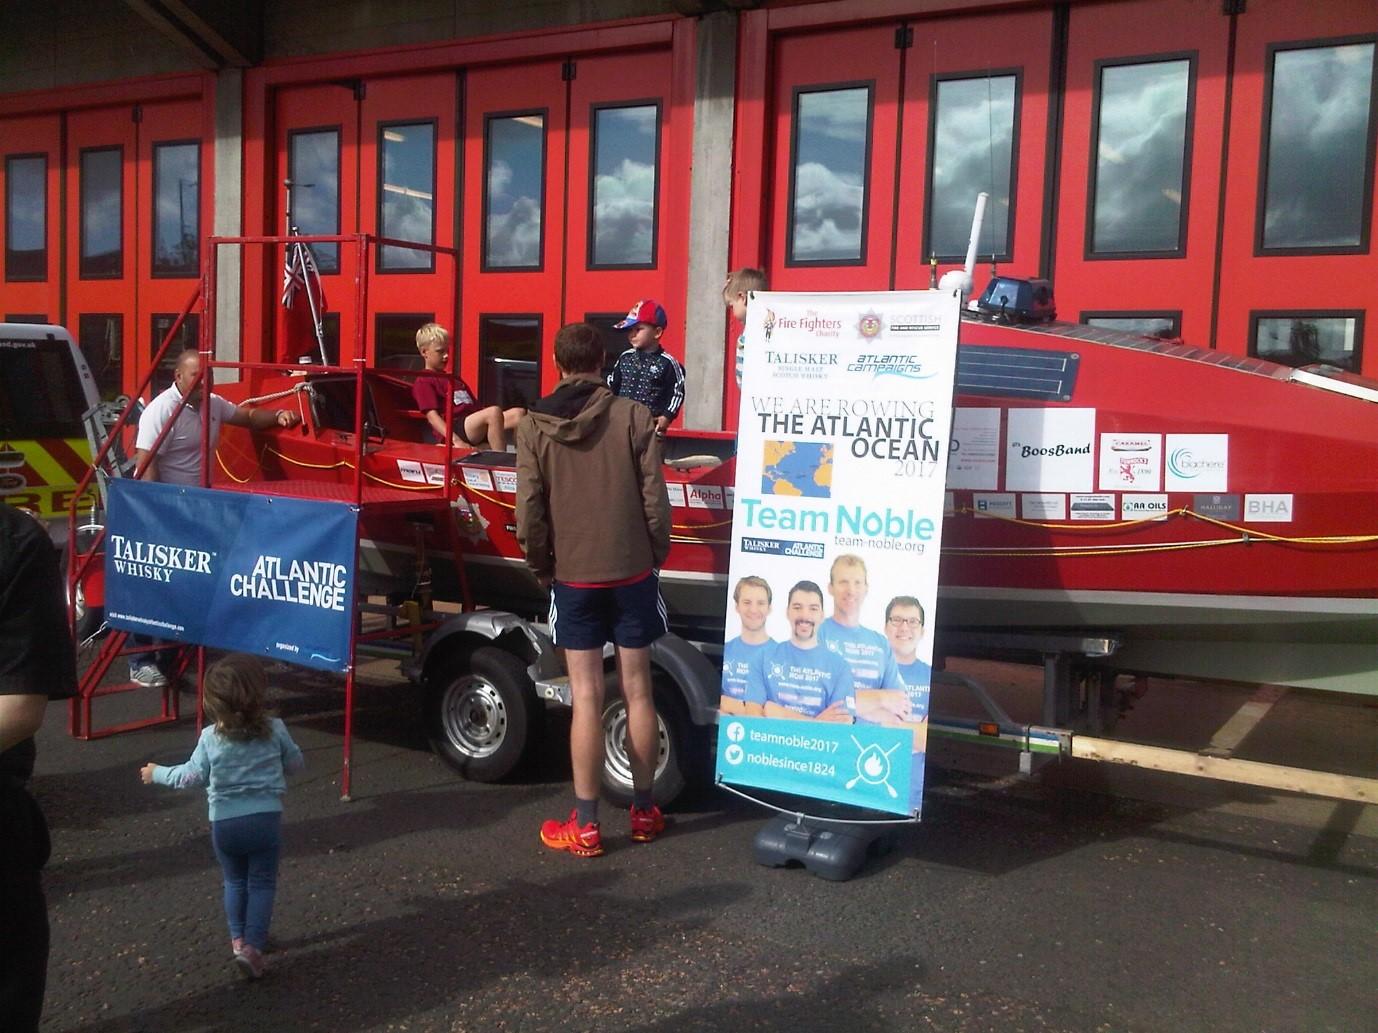 Perth Charity Efforts